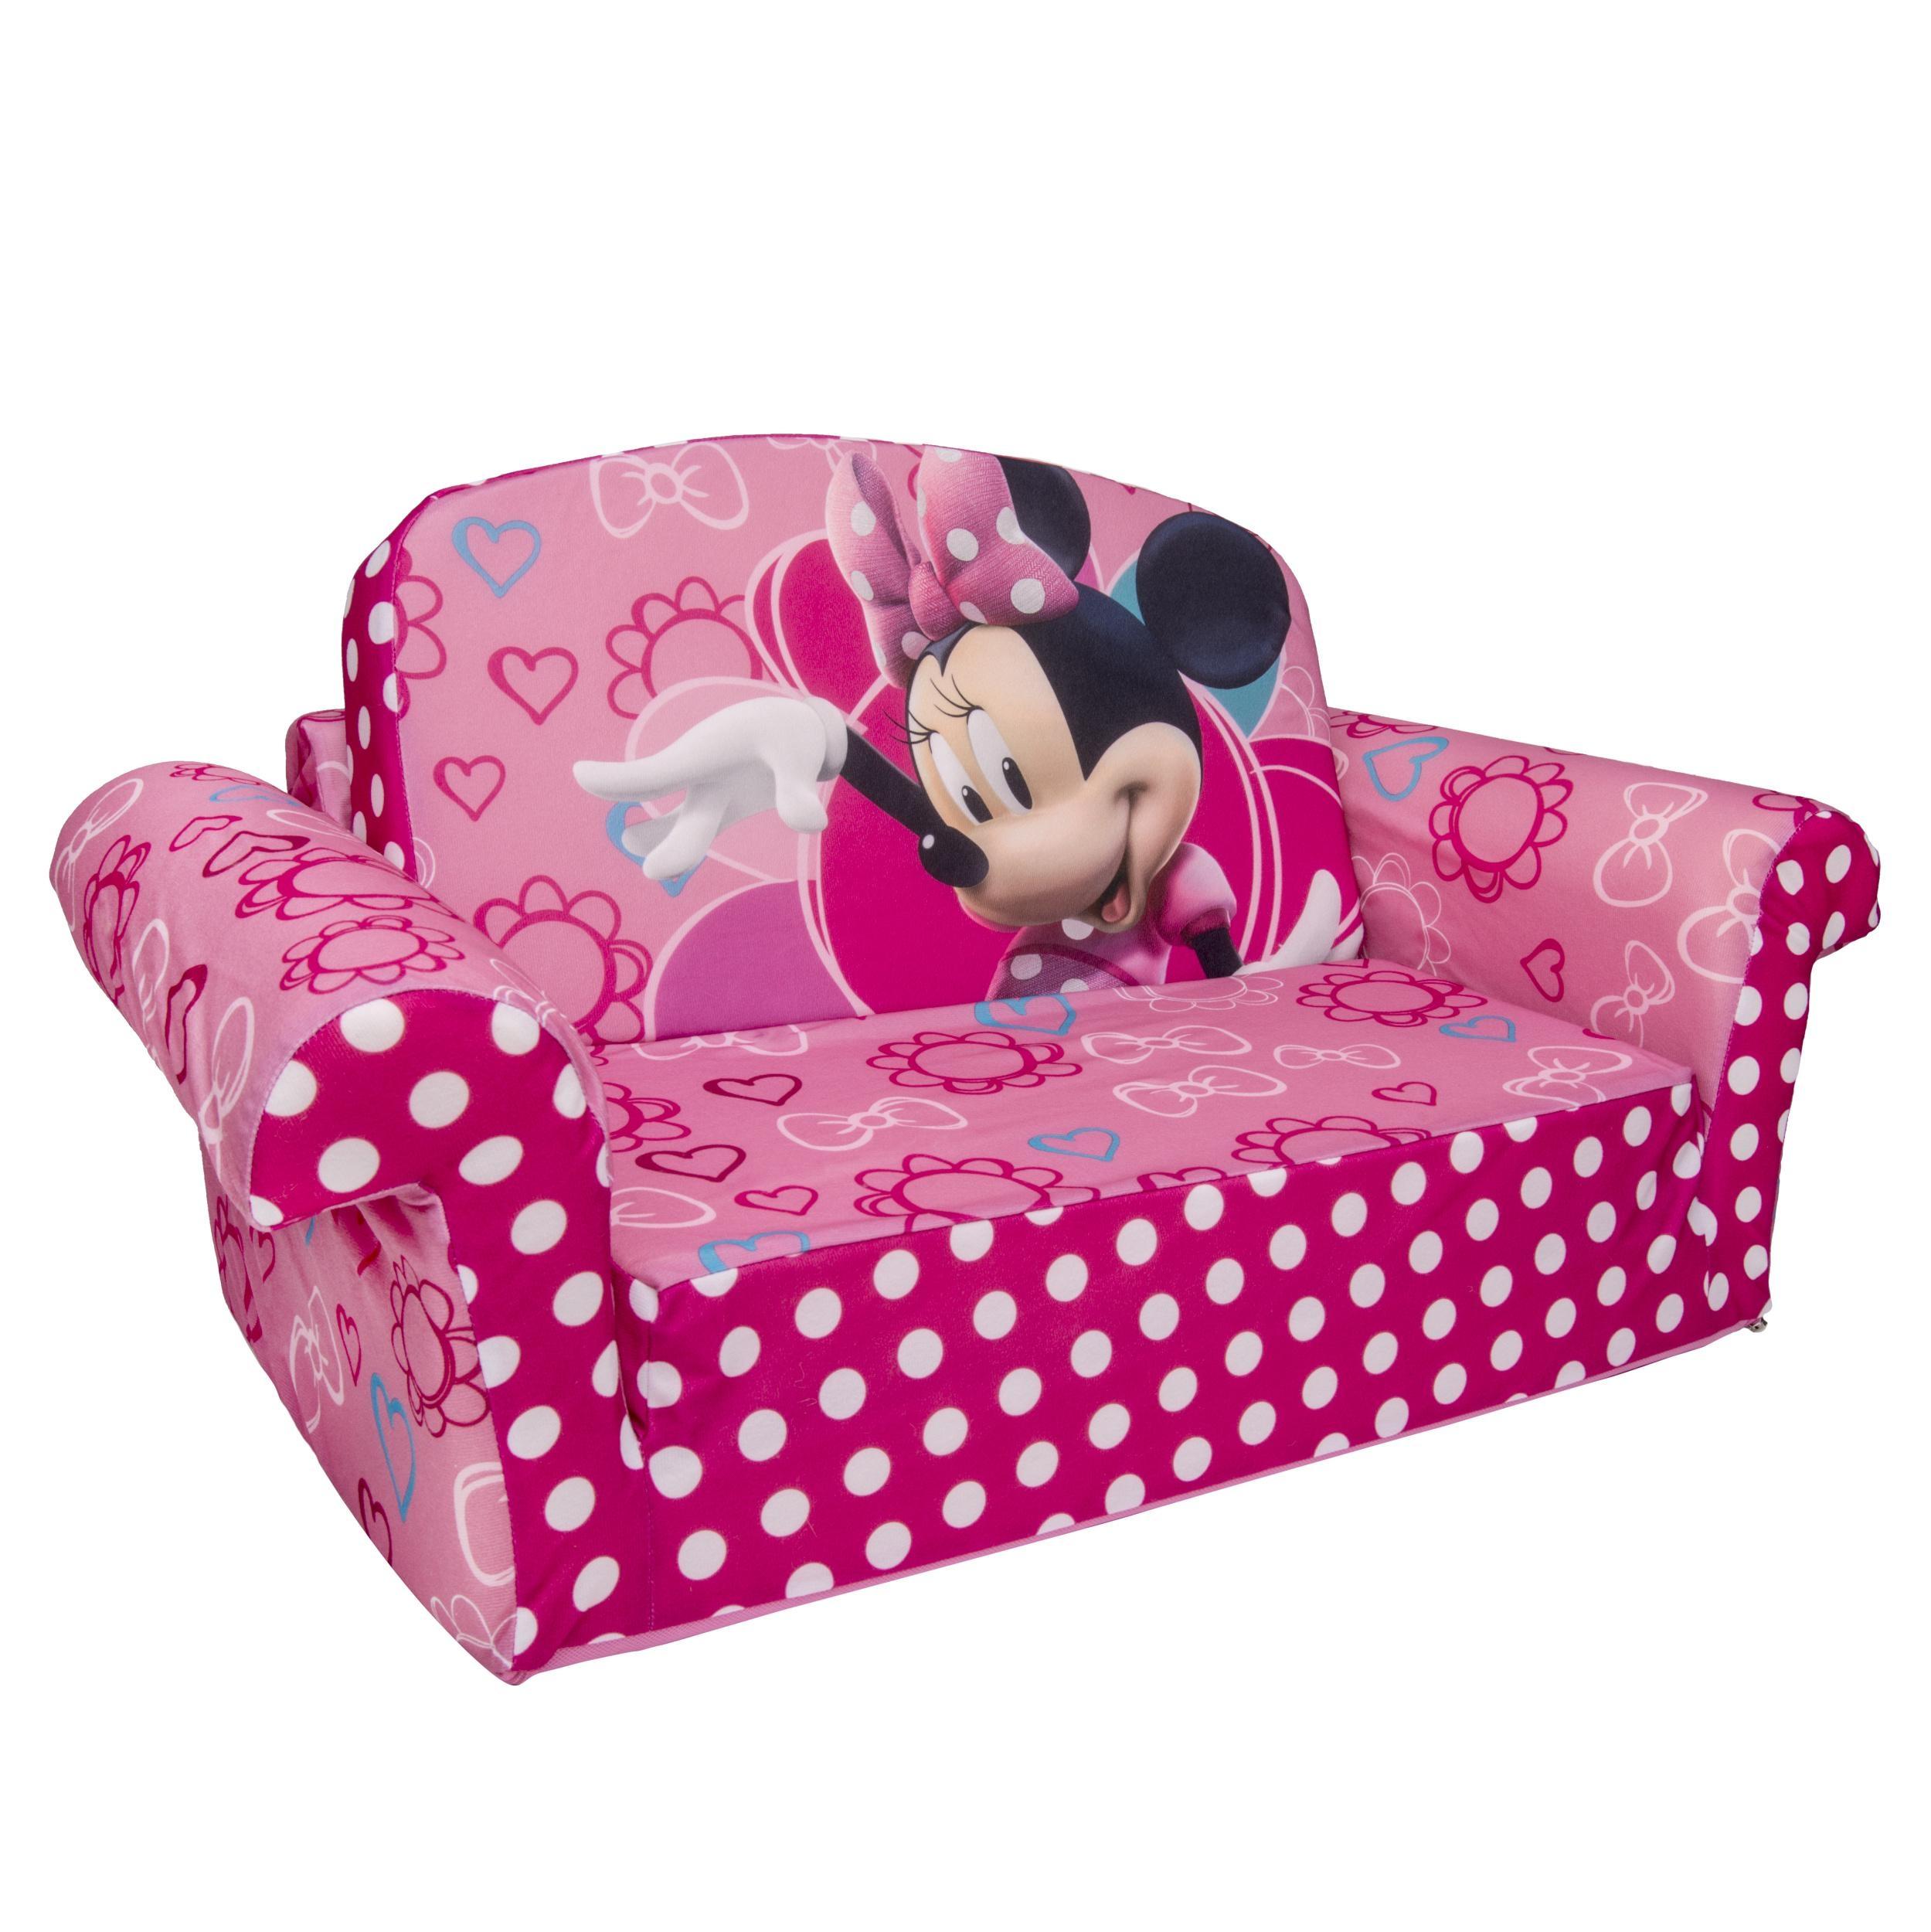 Marshmallow Furniture, Children's 2 In 1 Flip Open Foam Sofa Throughout Disney Sofas (Image 8 of 20)